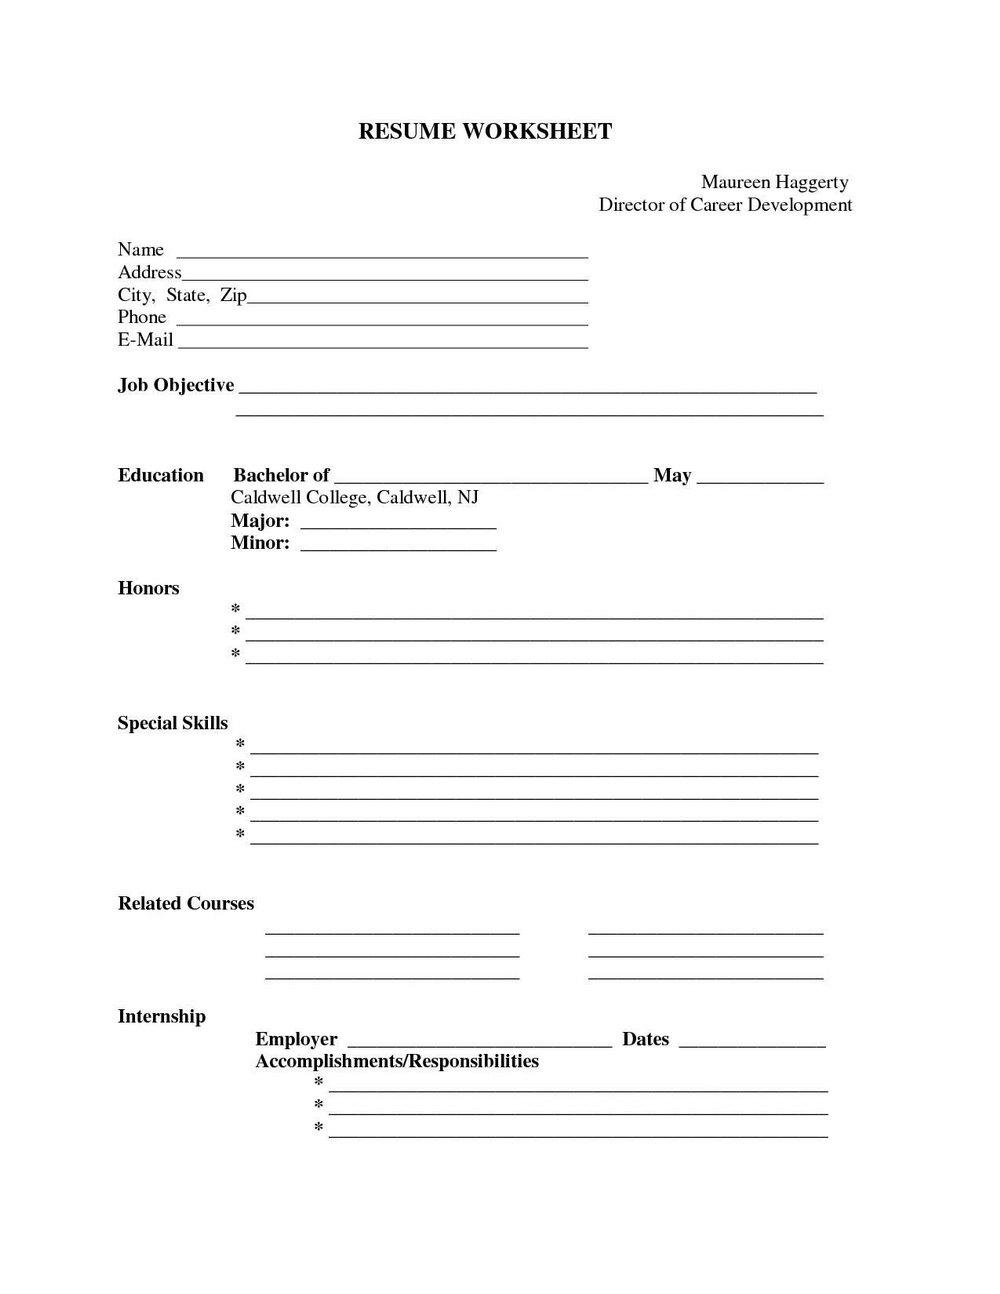 Free Blank Resumes To Print